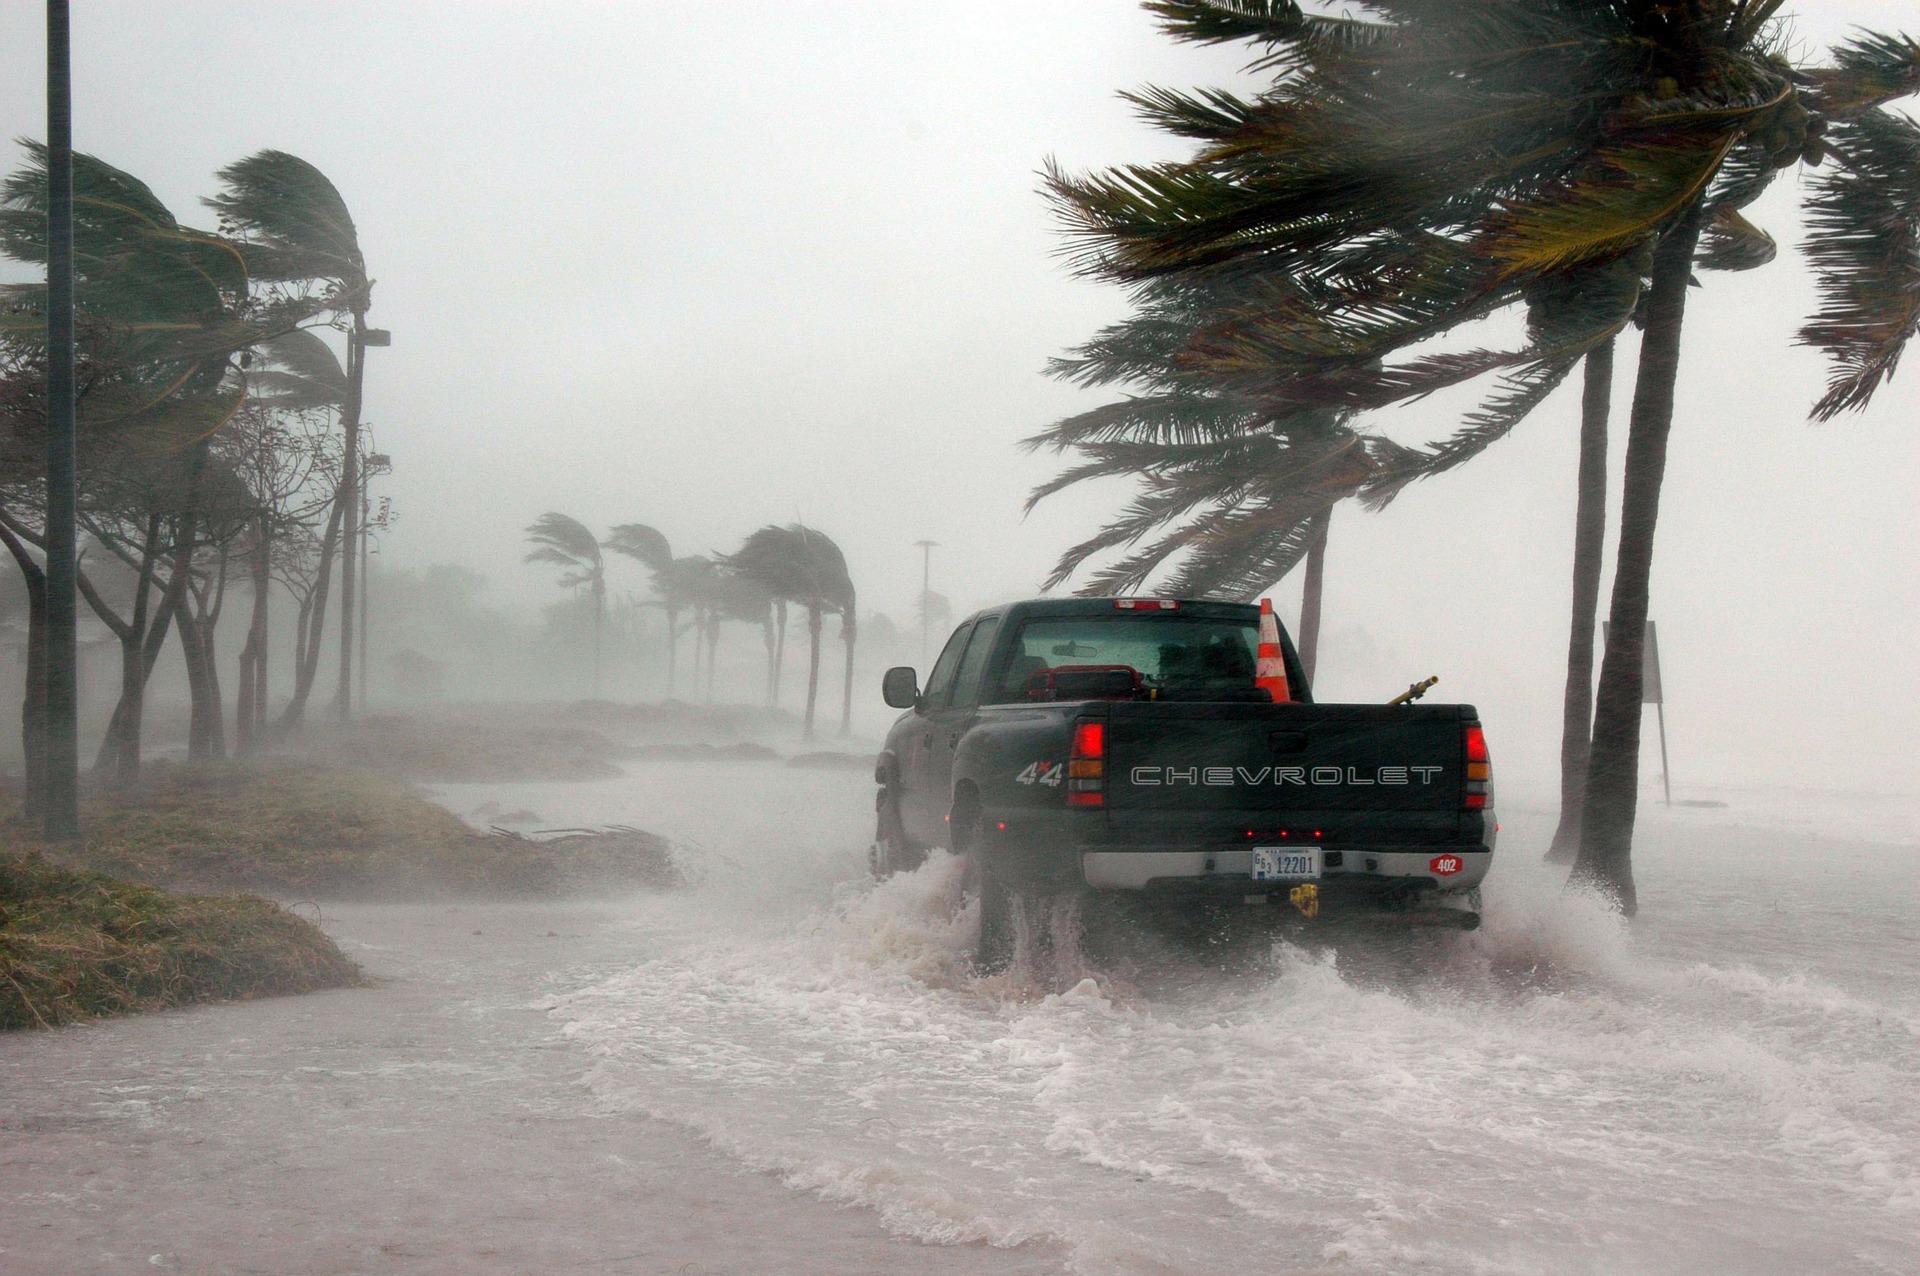 Governor Ron DeSantis Urges Floridians to Prepare as Hurricane Season Begins